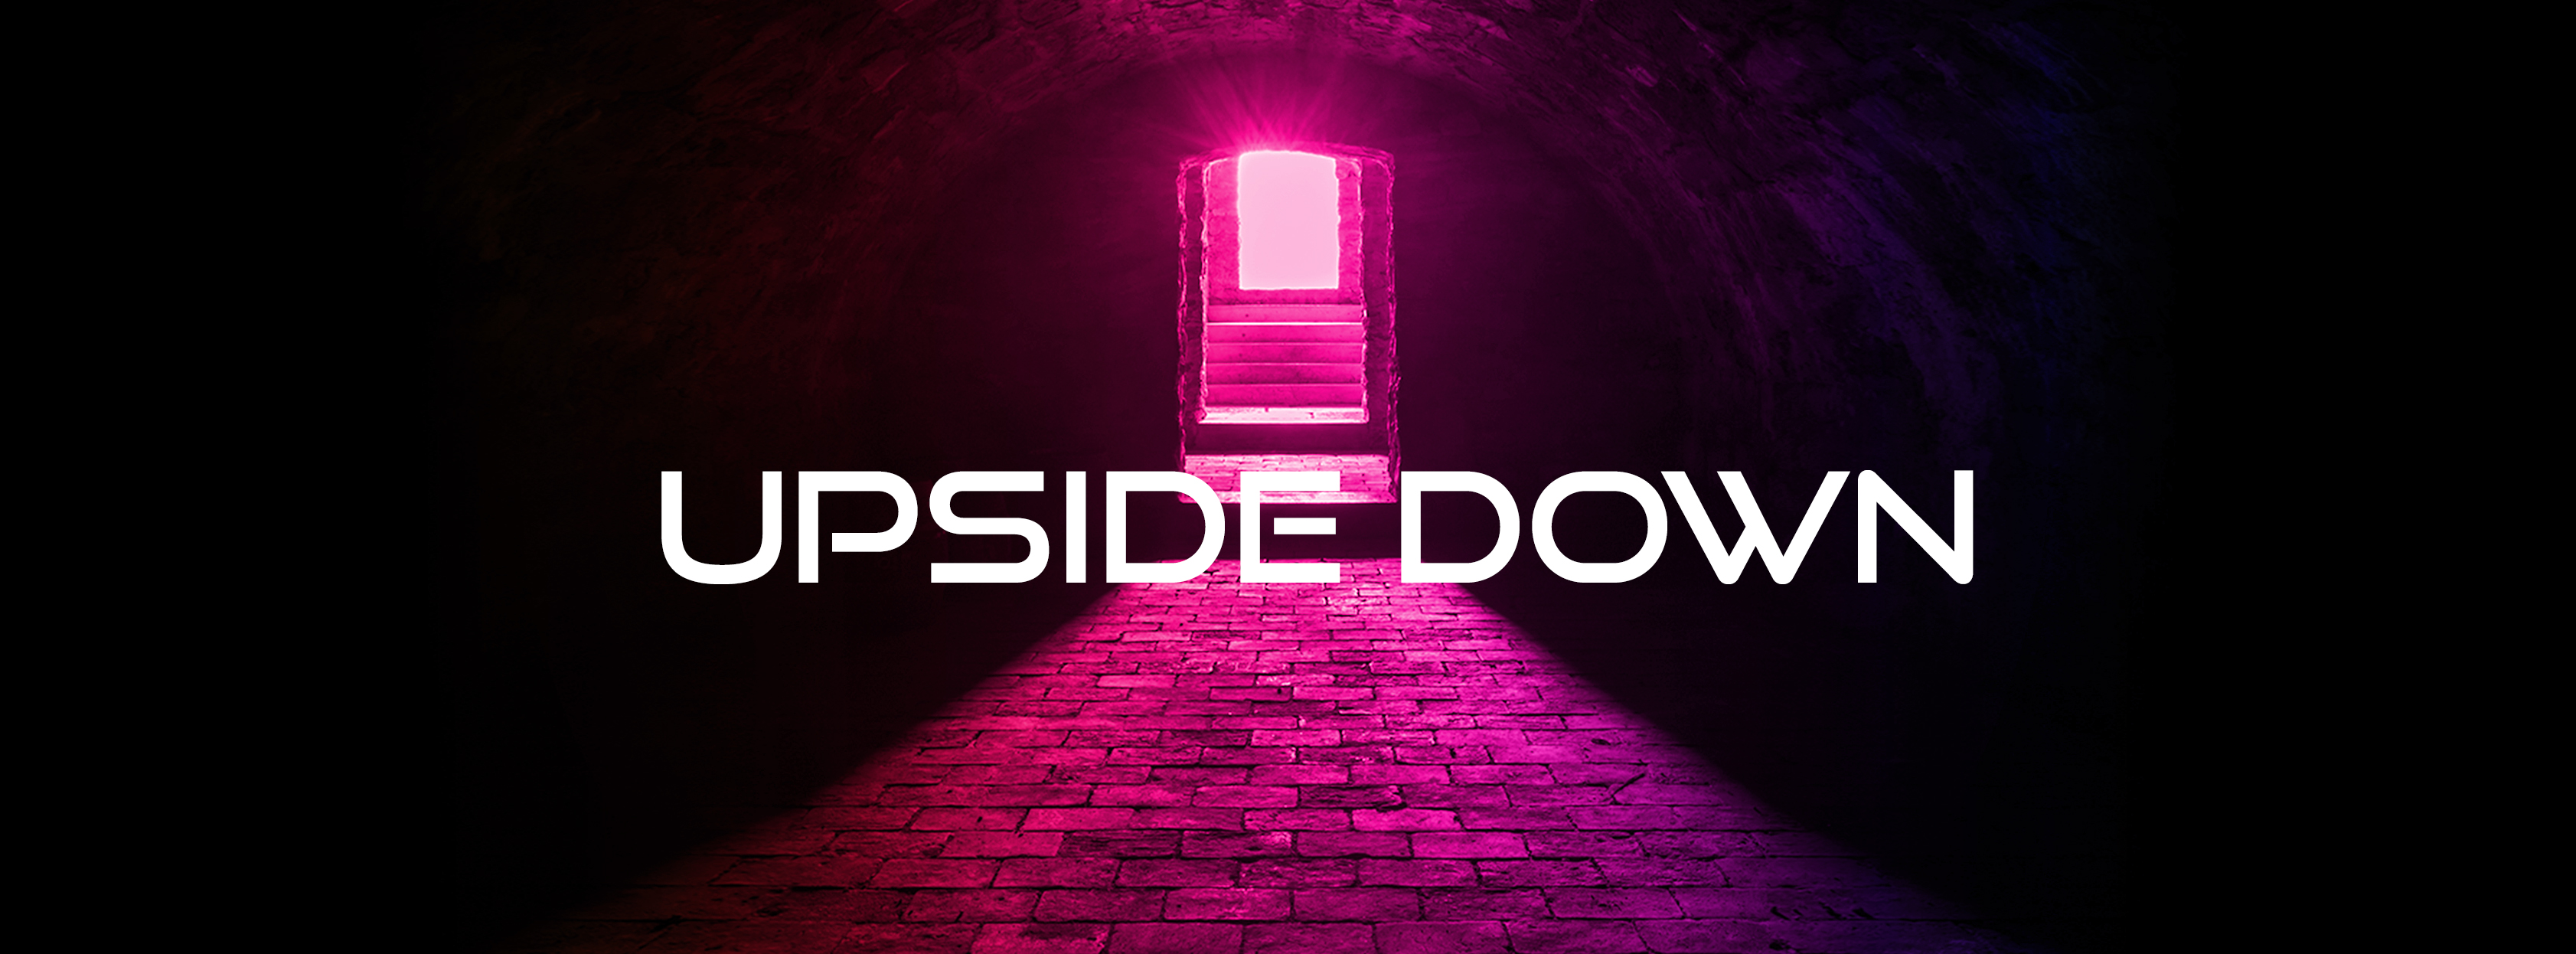 FFR • Upside Down